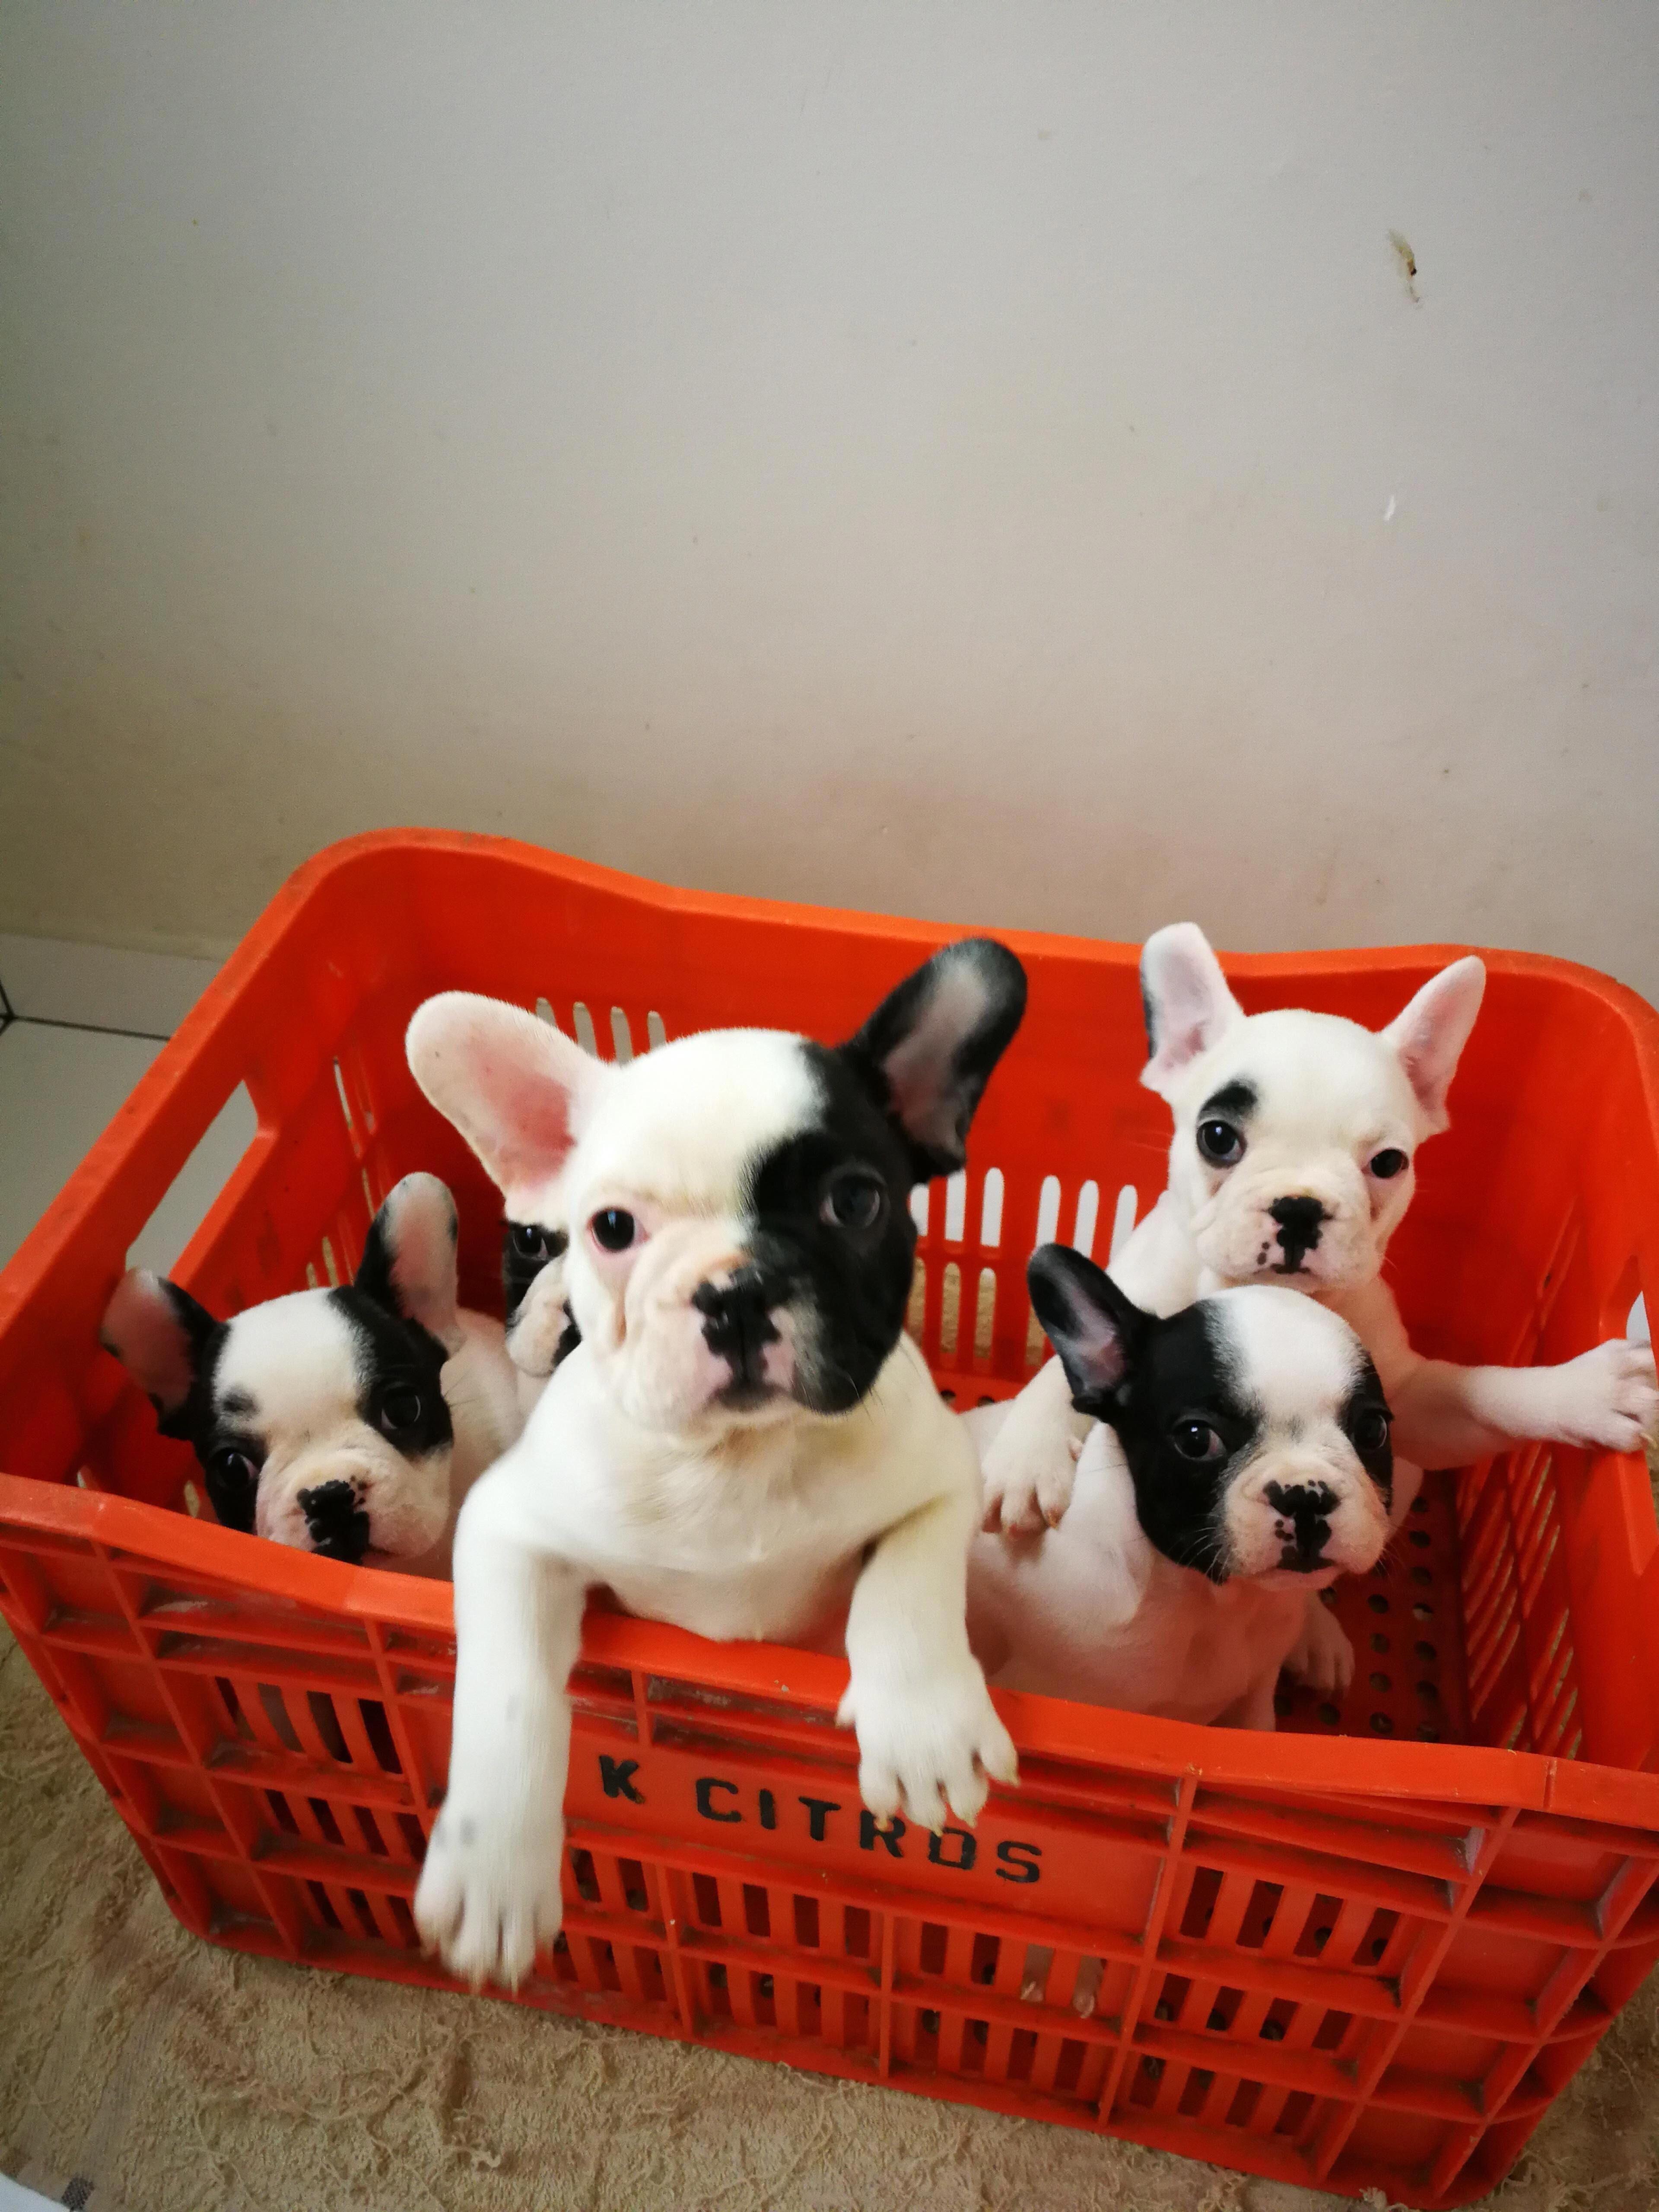 Bulldogpups Frenchies Bulldog Puppies French Bulldog Puppies